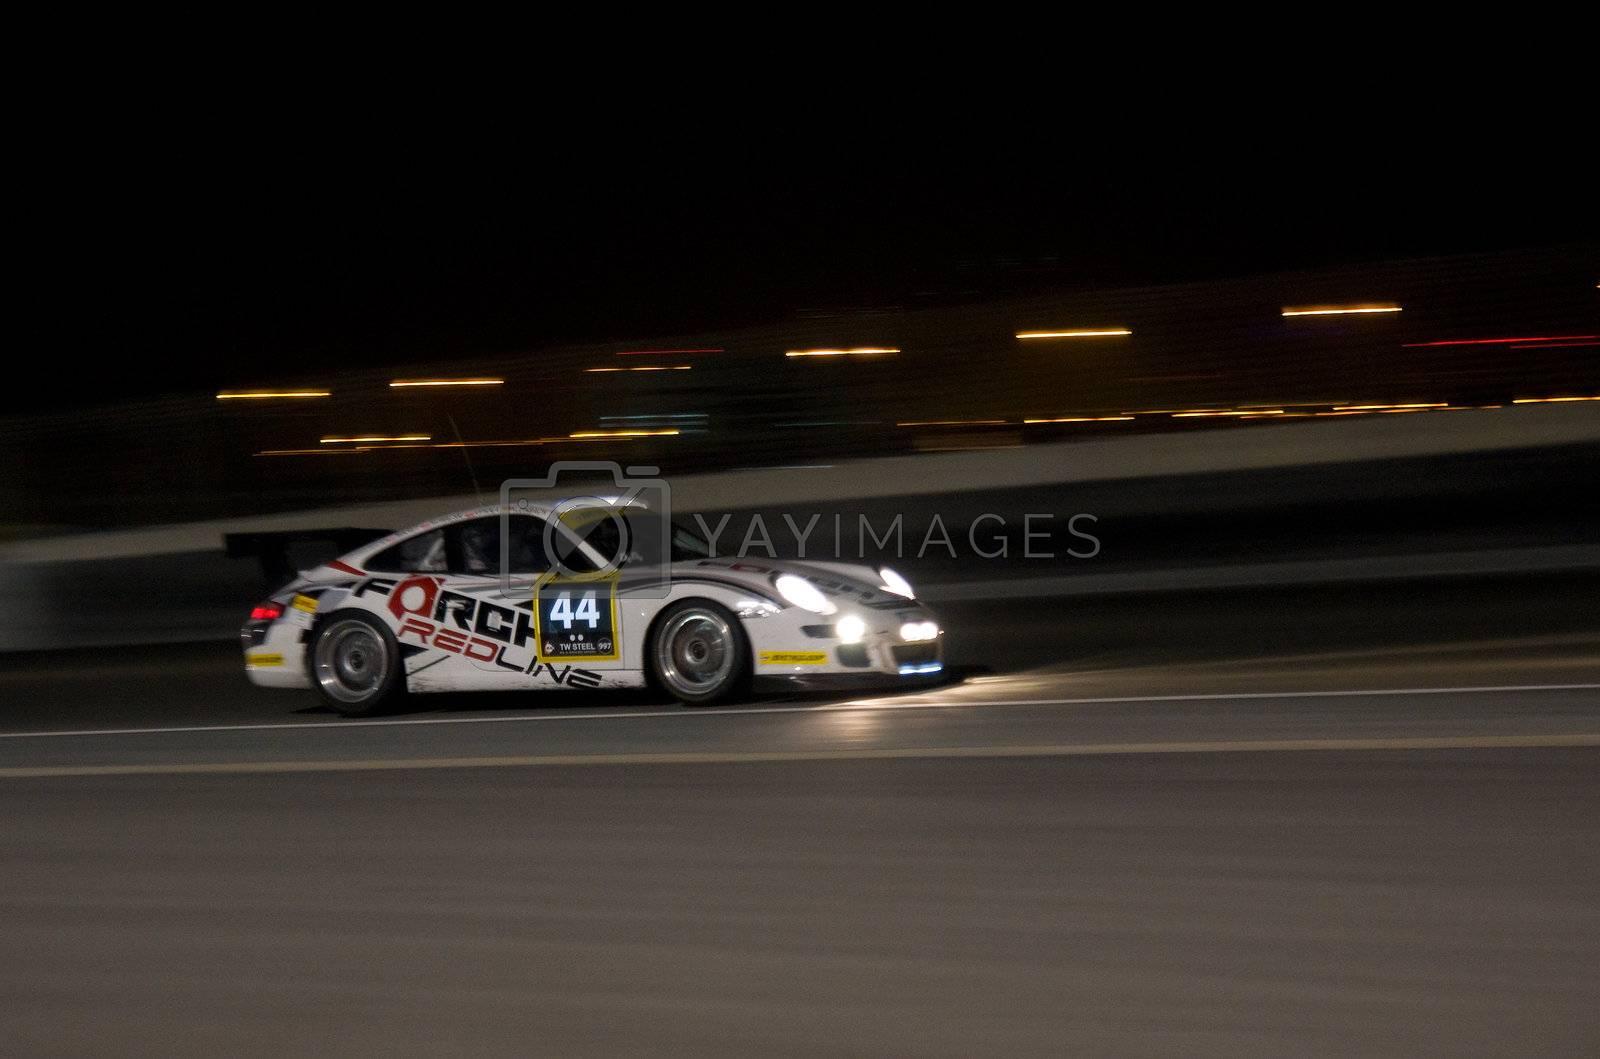 DUBAI - JANUARY 13: Car 44, a Porsche 997 GT3 Cup at night during the 2012 Dunlop 24 Hour Race at Dubai Autodrome on January 13, 2012.